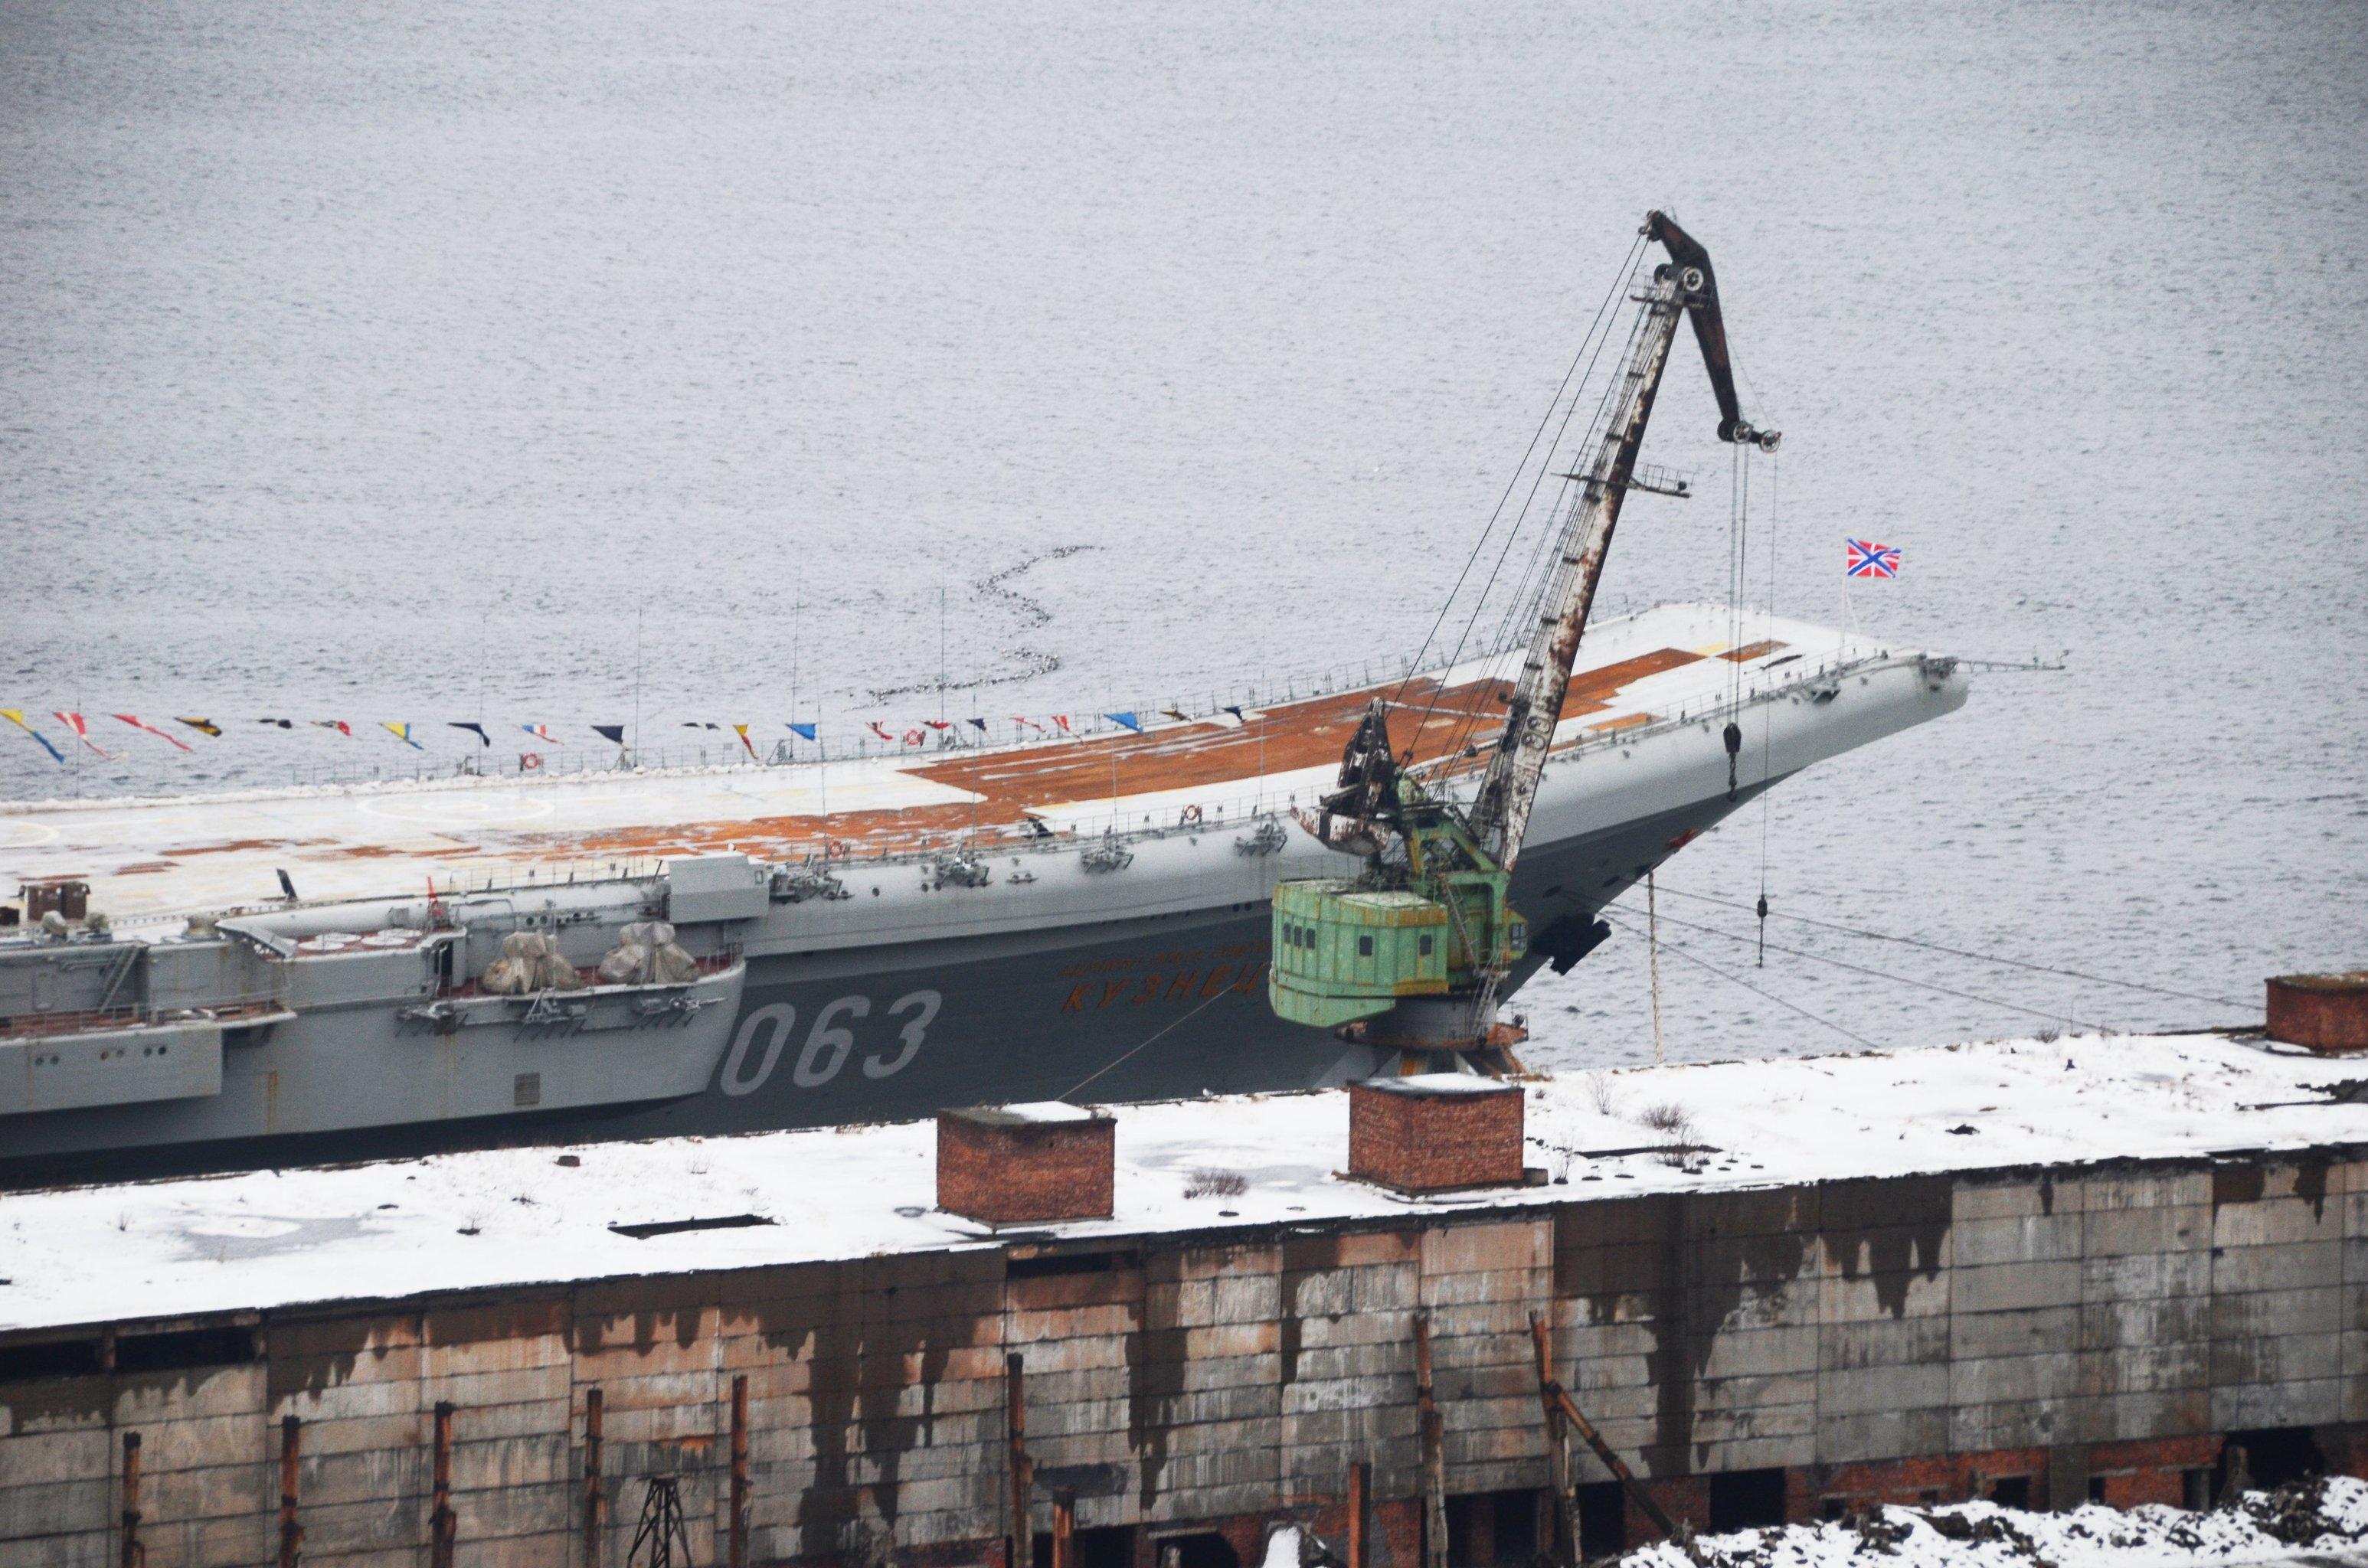 Aircraft Carrier Admiral Kuznetsov: News #2 - Page 10 13-6866573-1532672163